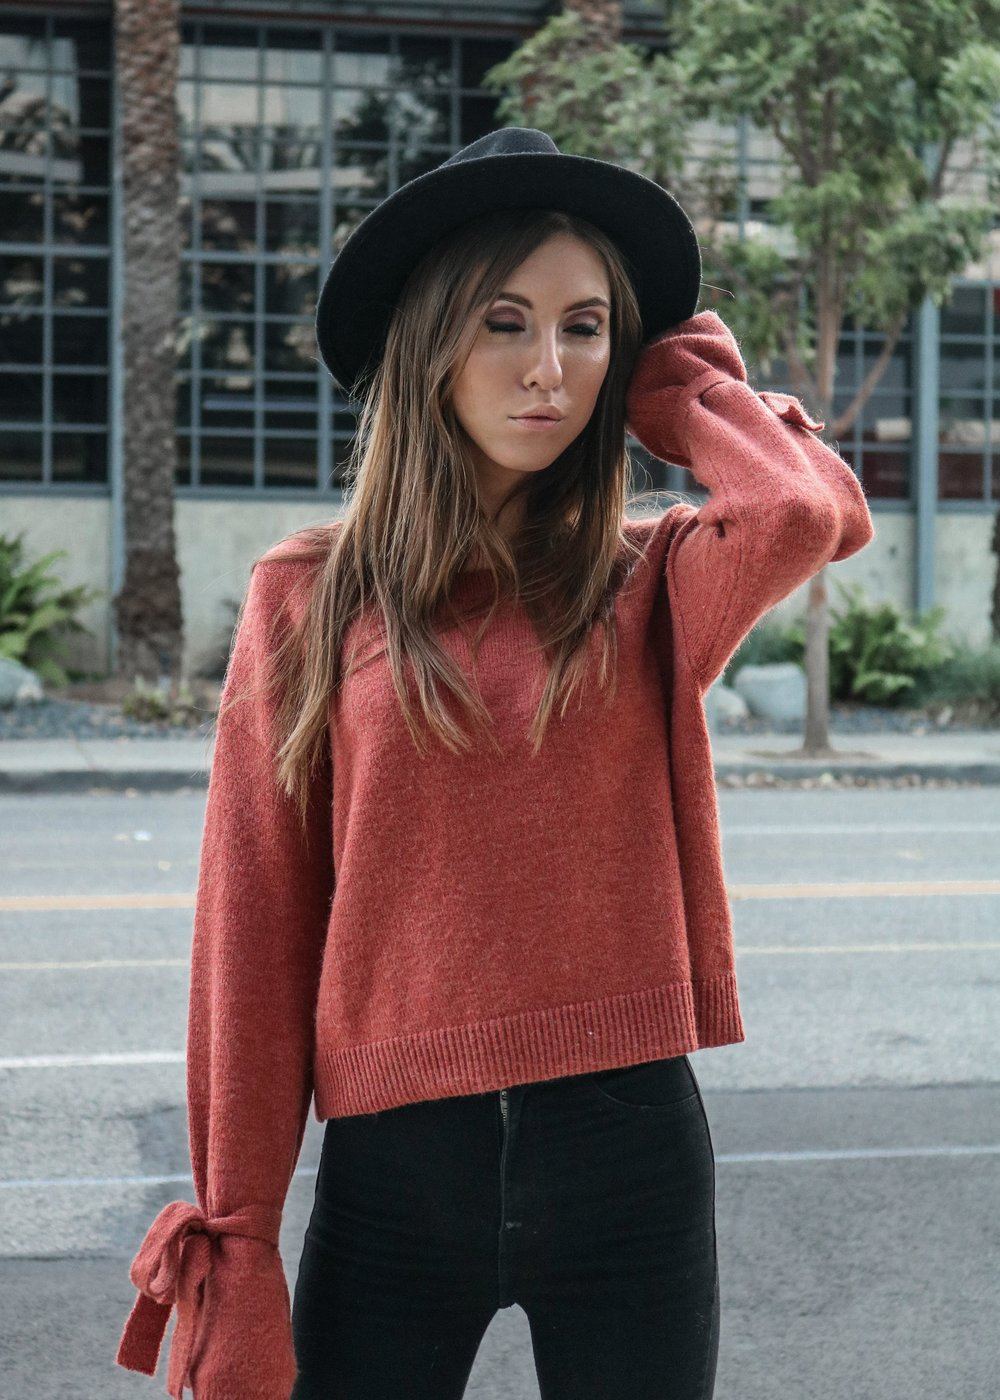 The Hungarian Brunette Burnt orange sweater statement sleeves (16 of 17).jpg